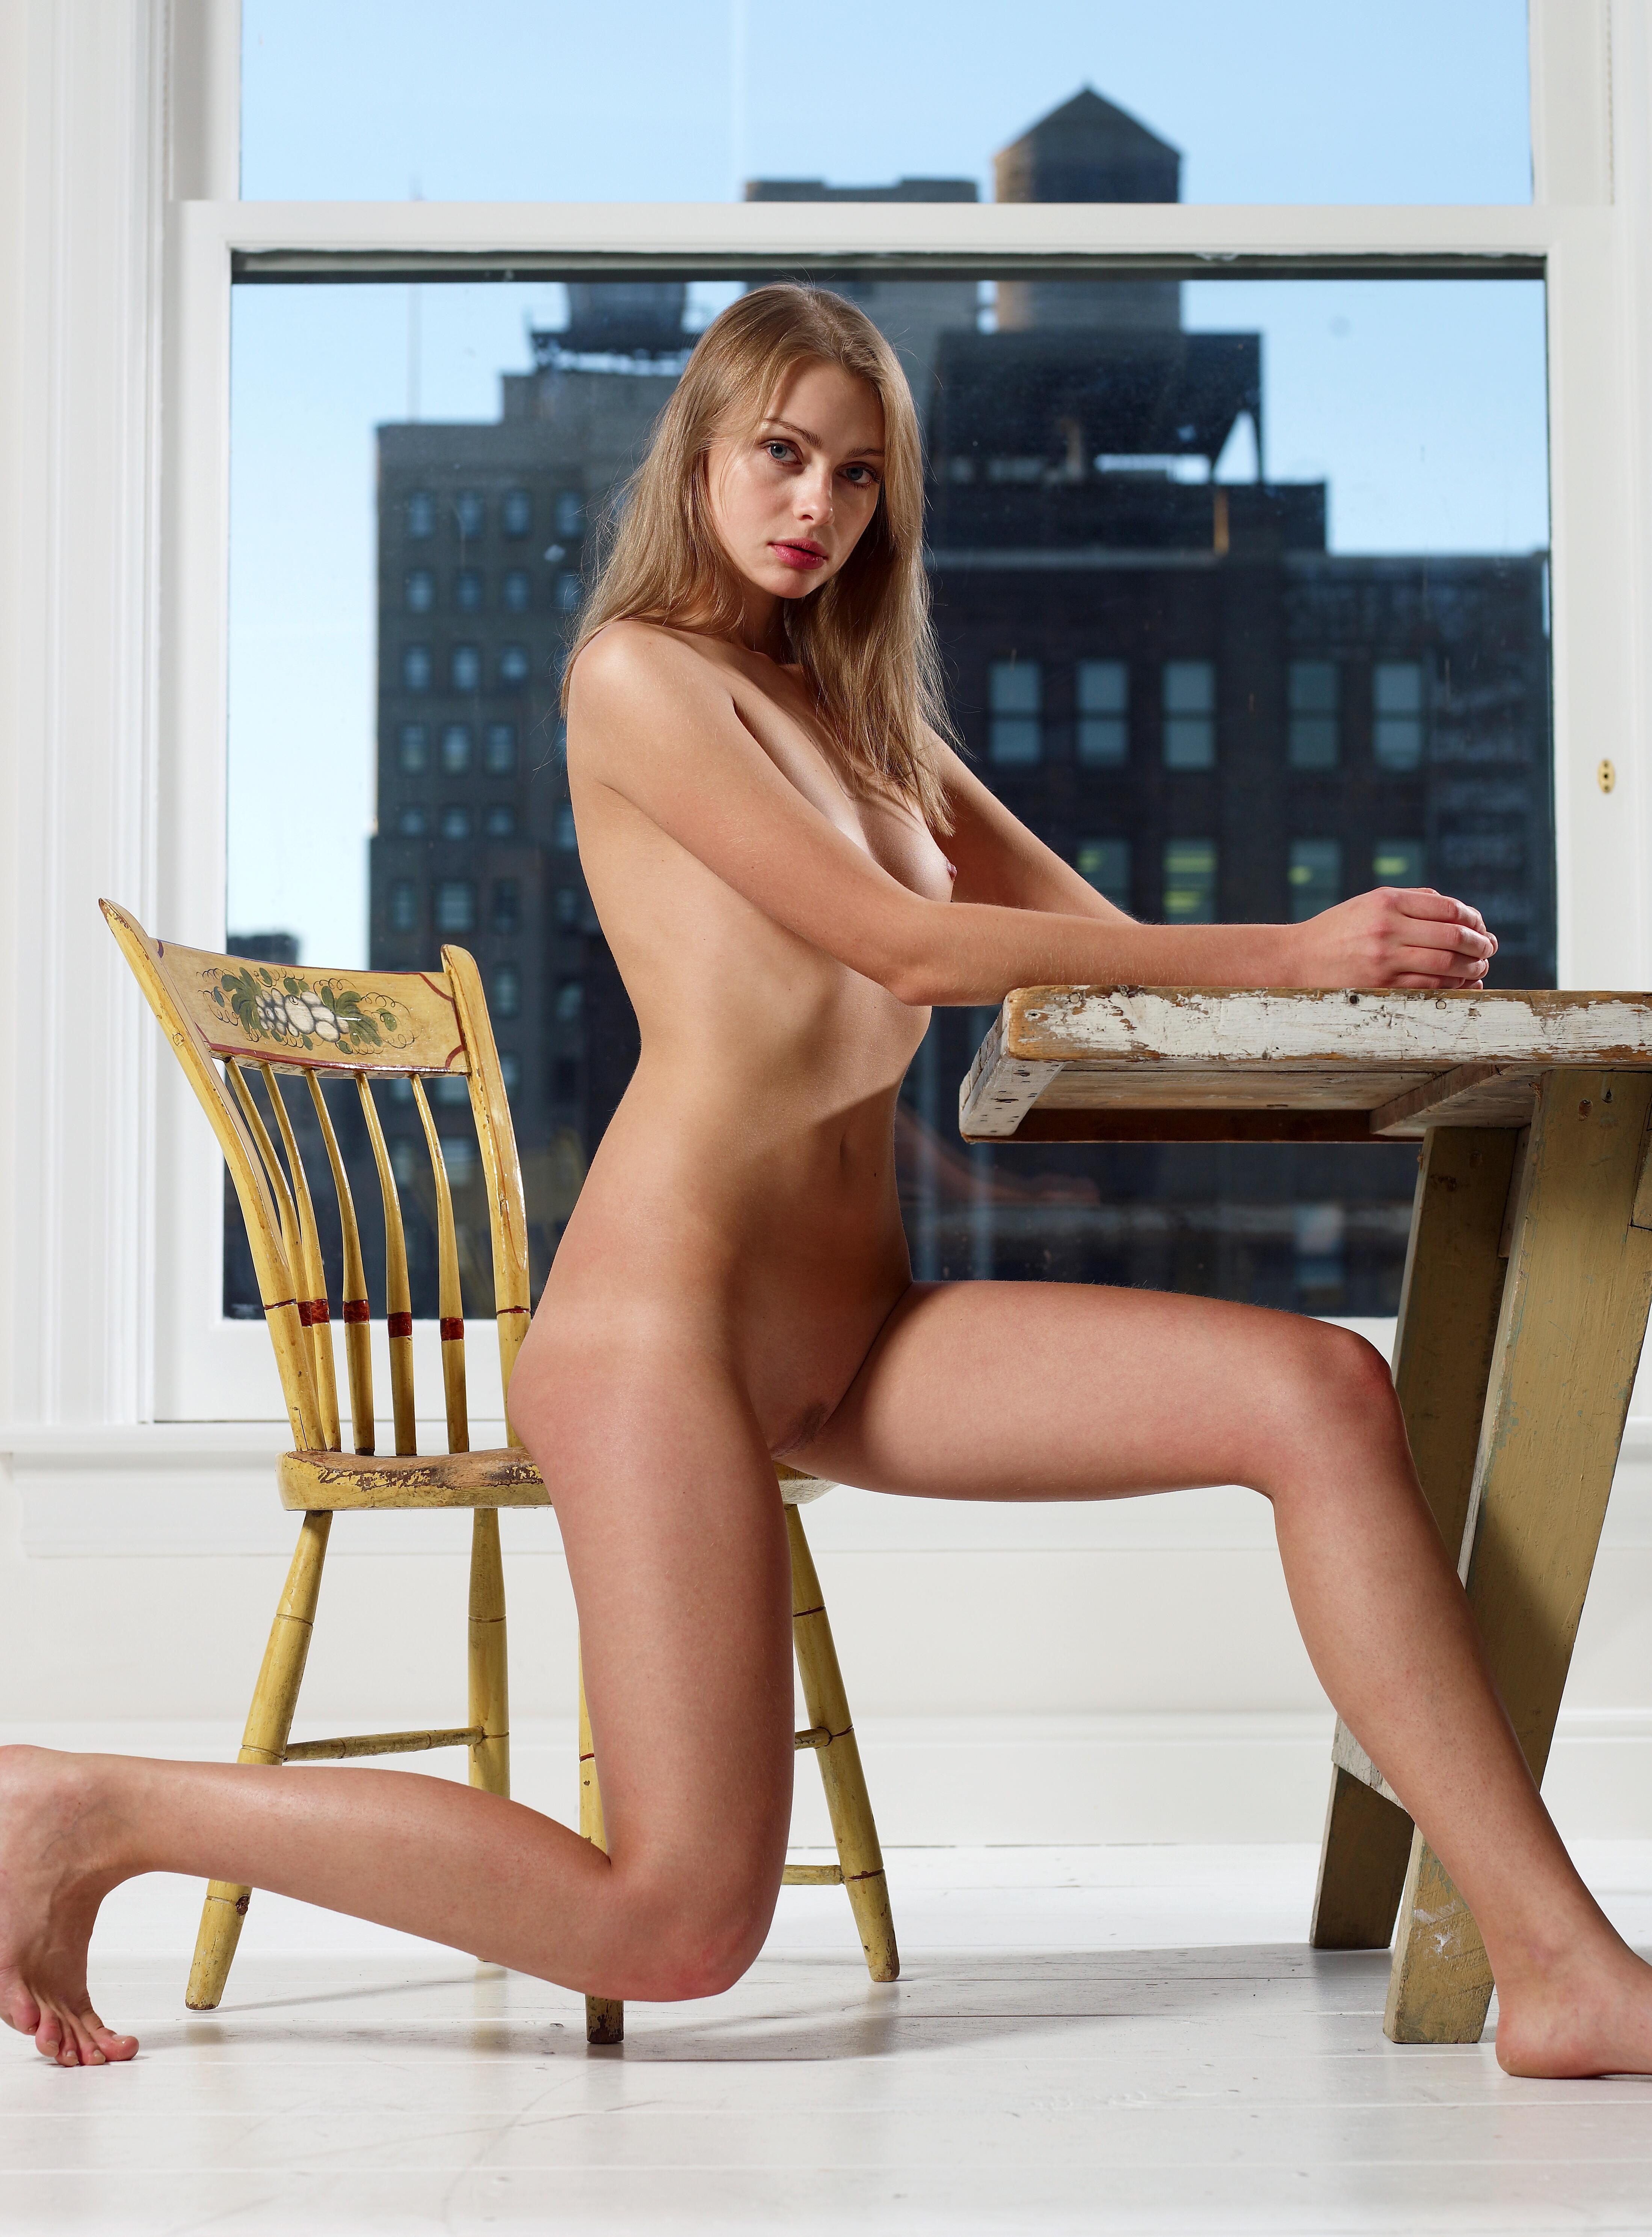 veronika babko naked Veronika Babko Naked Veronika Babko Naked Page